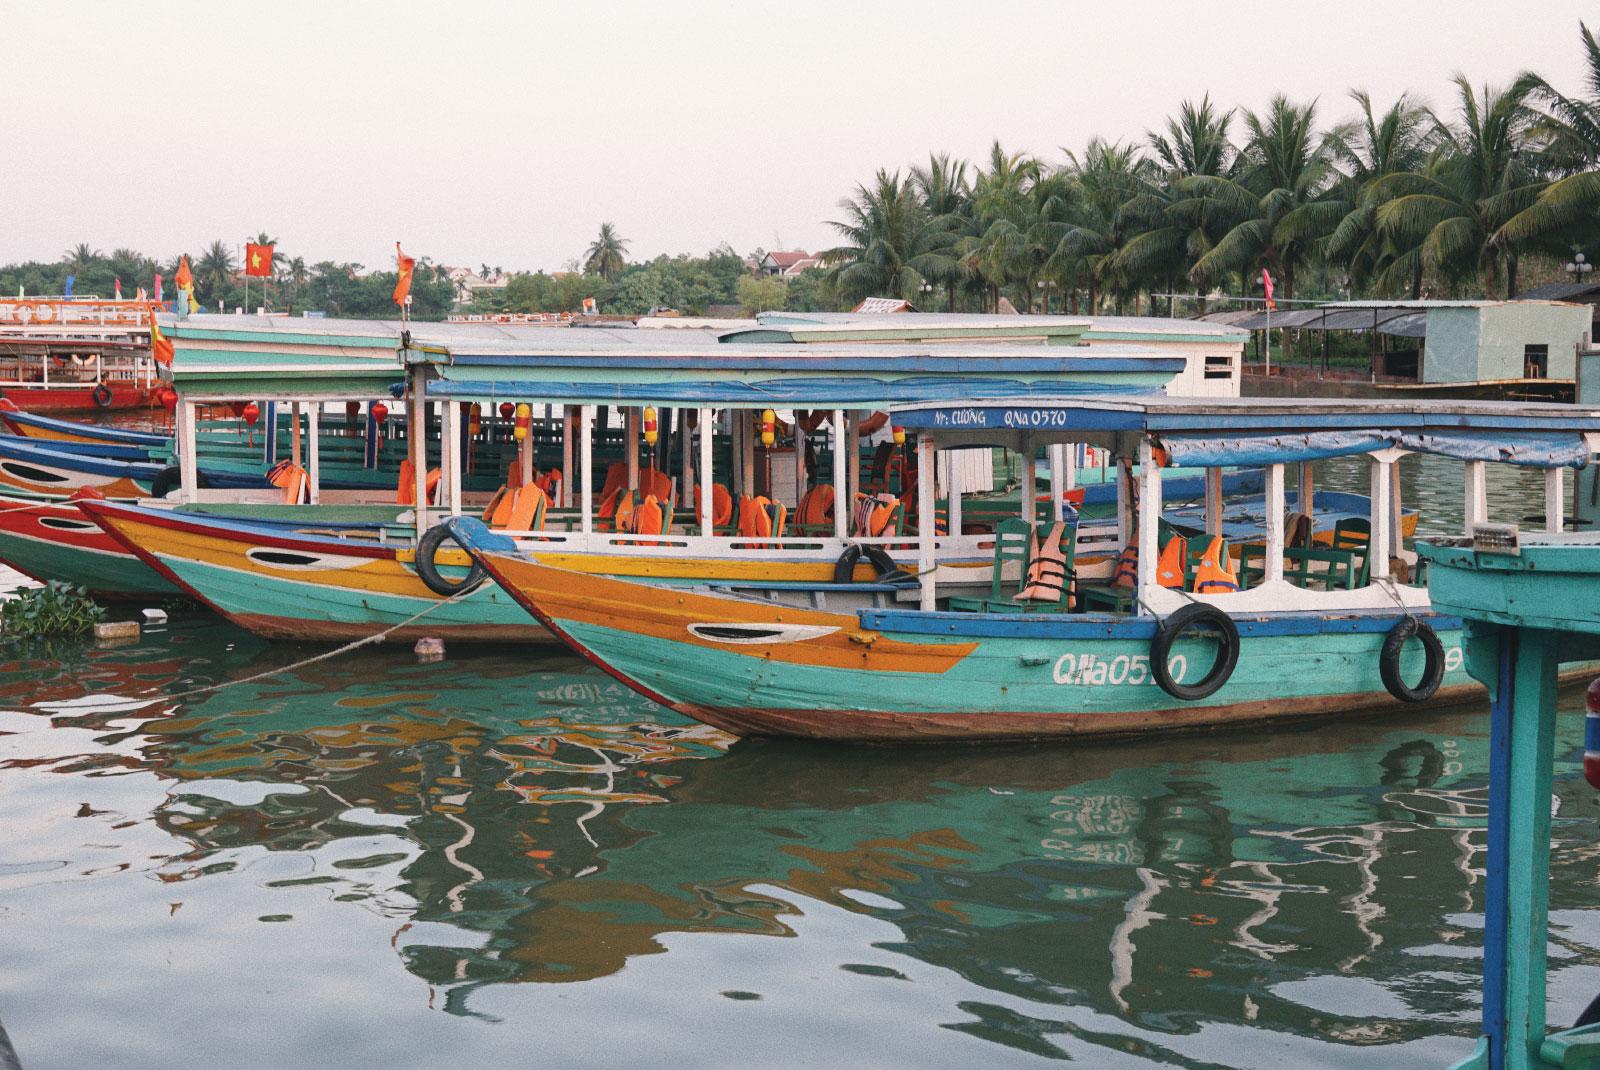 eternally-en-route-hoi-an-vietnam-44.jpg